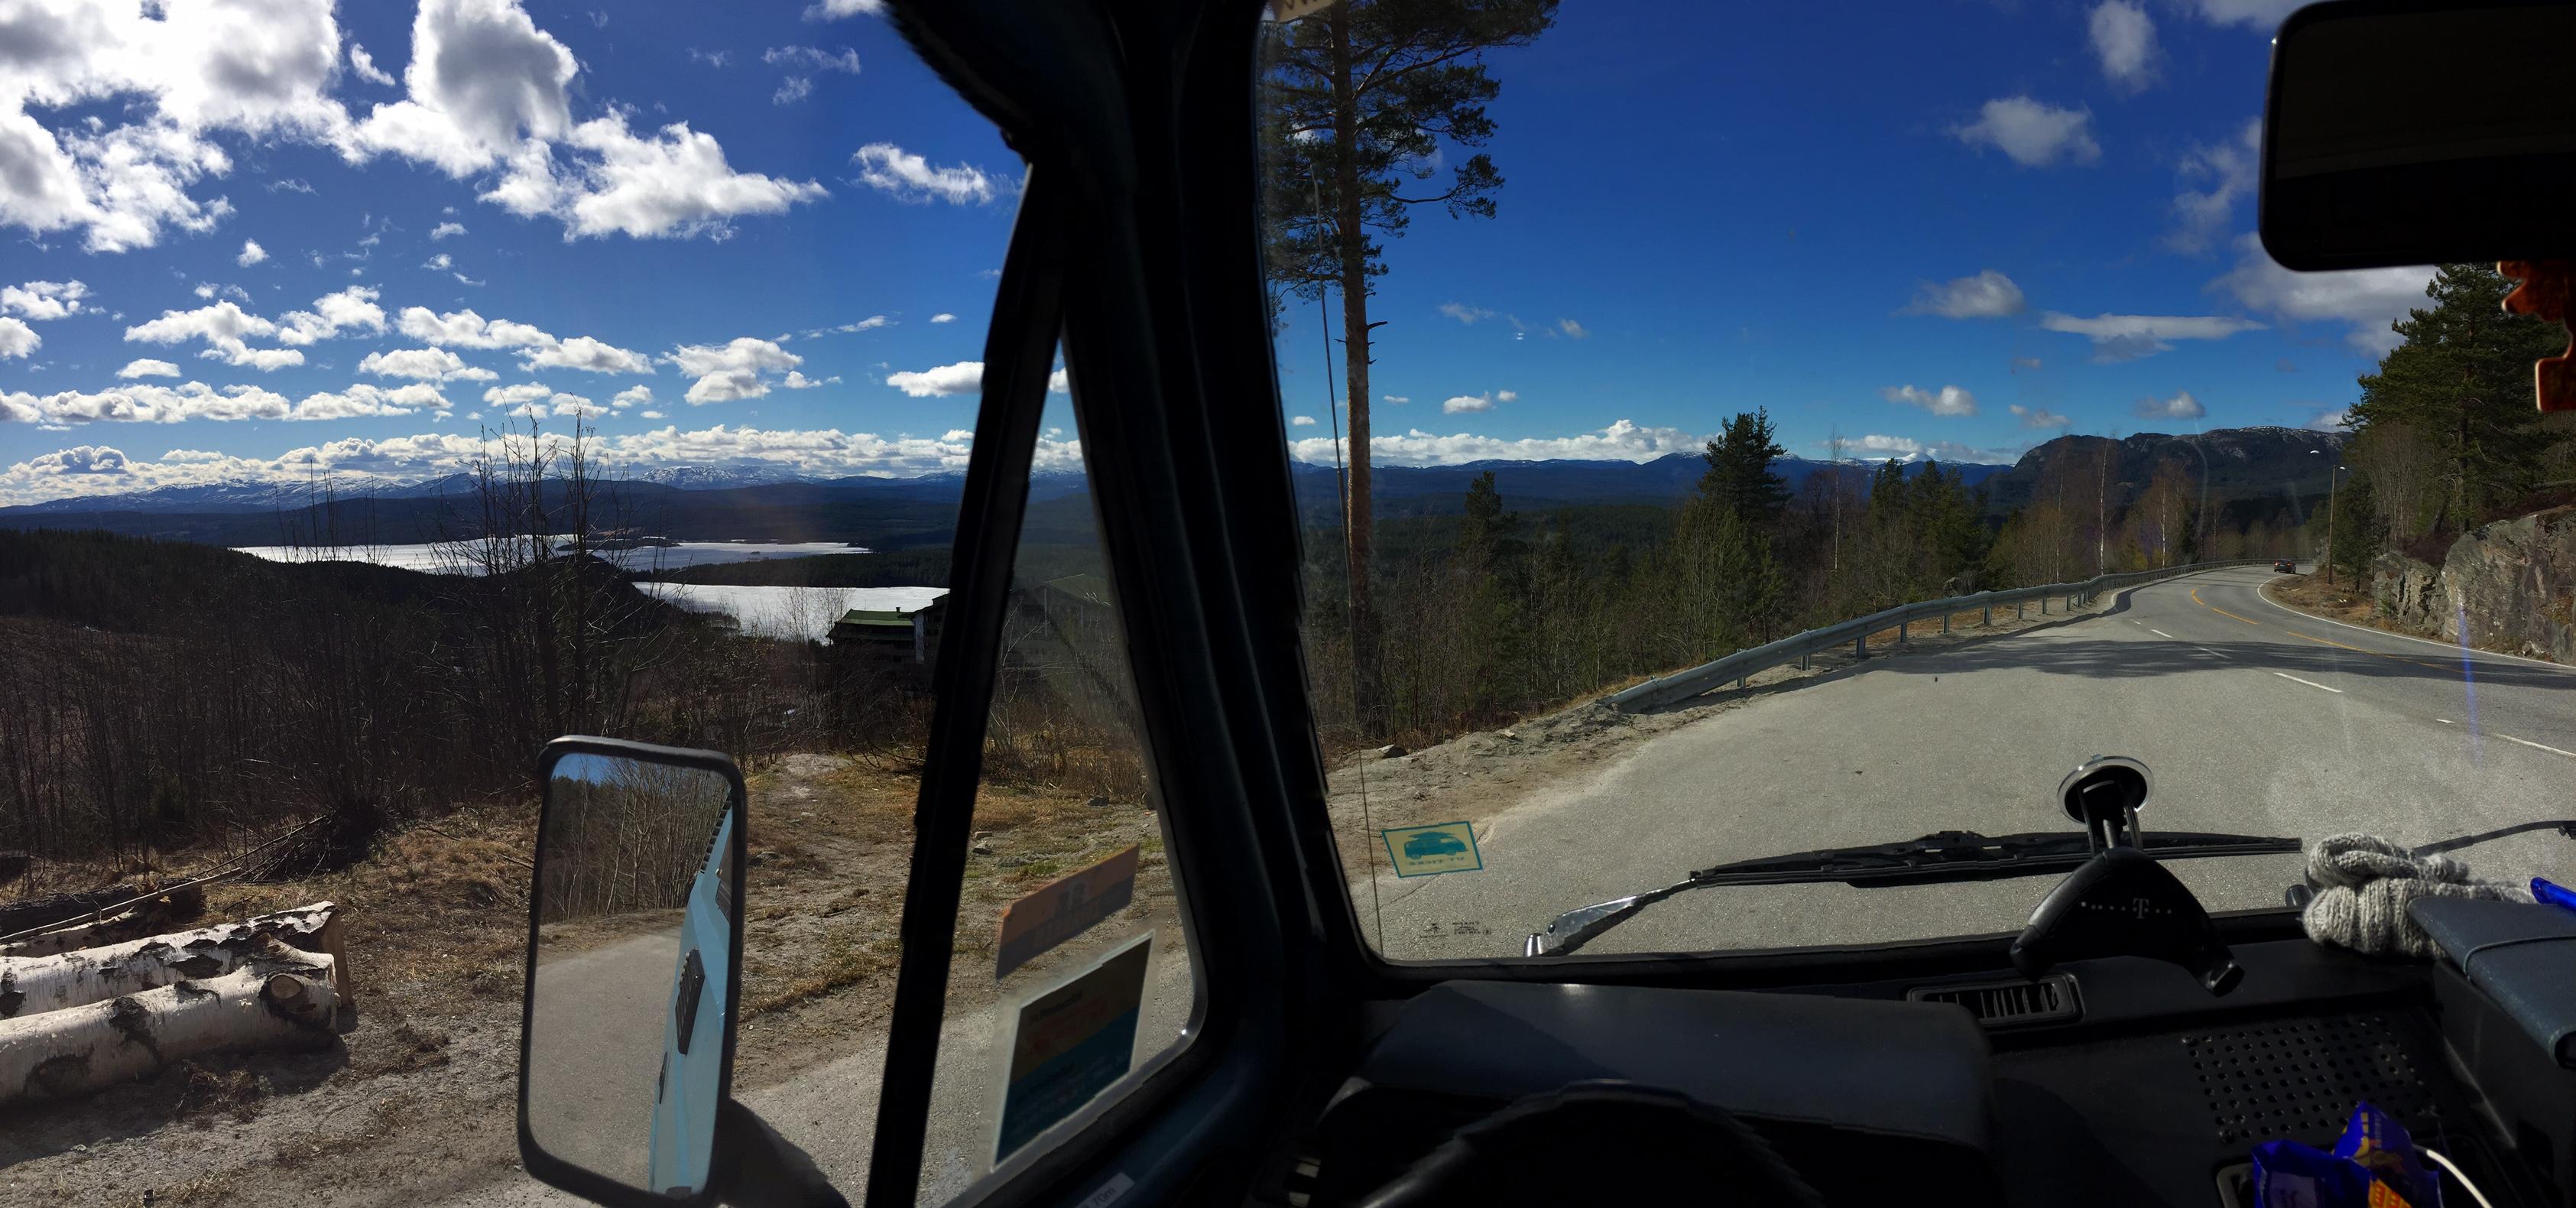 VW-T3-camper-mieten-rostock-urlaub-ostsee-schweden-norwegen-betti7